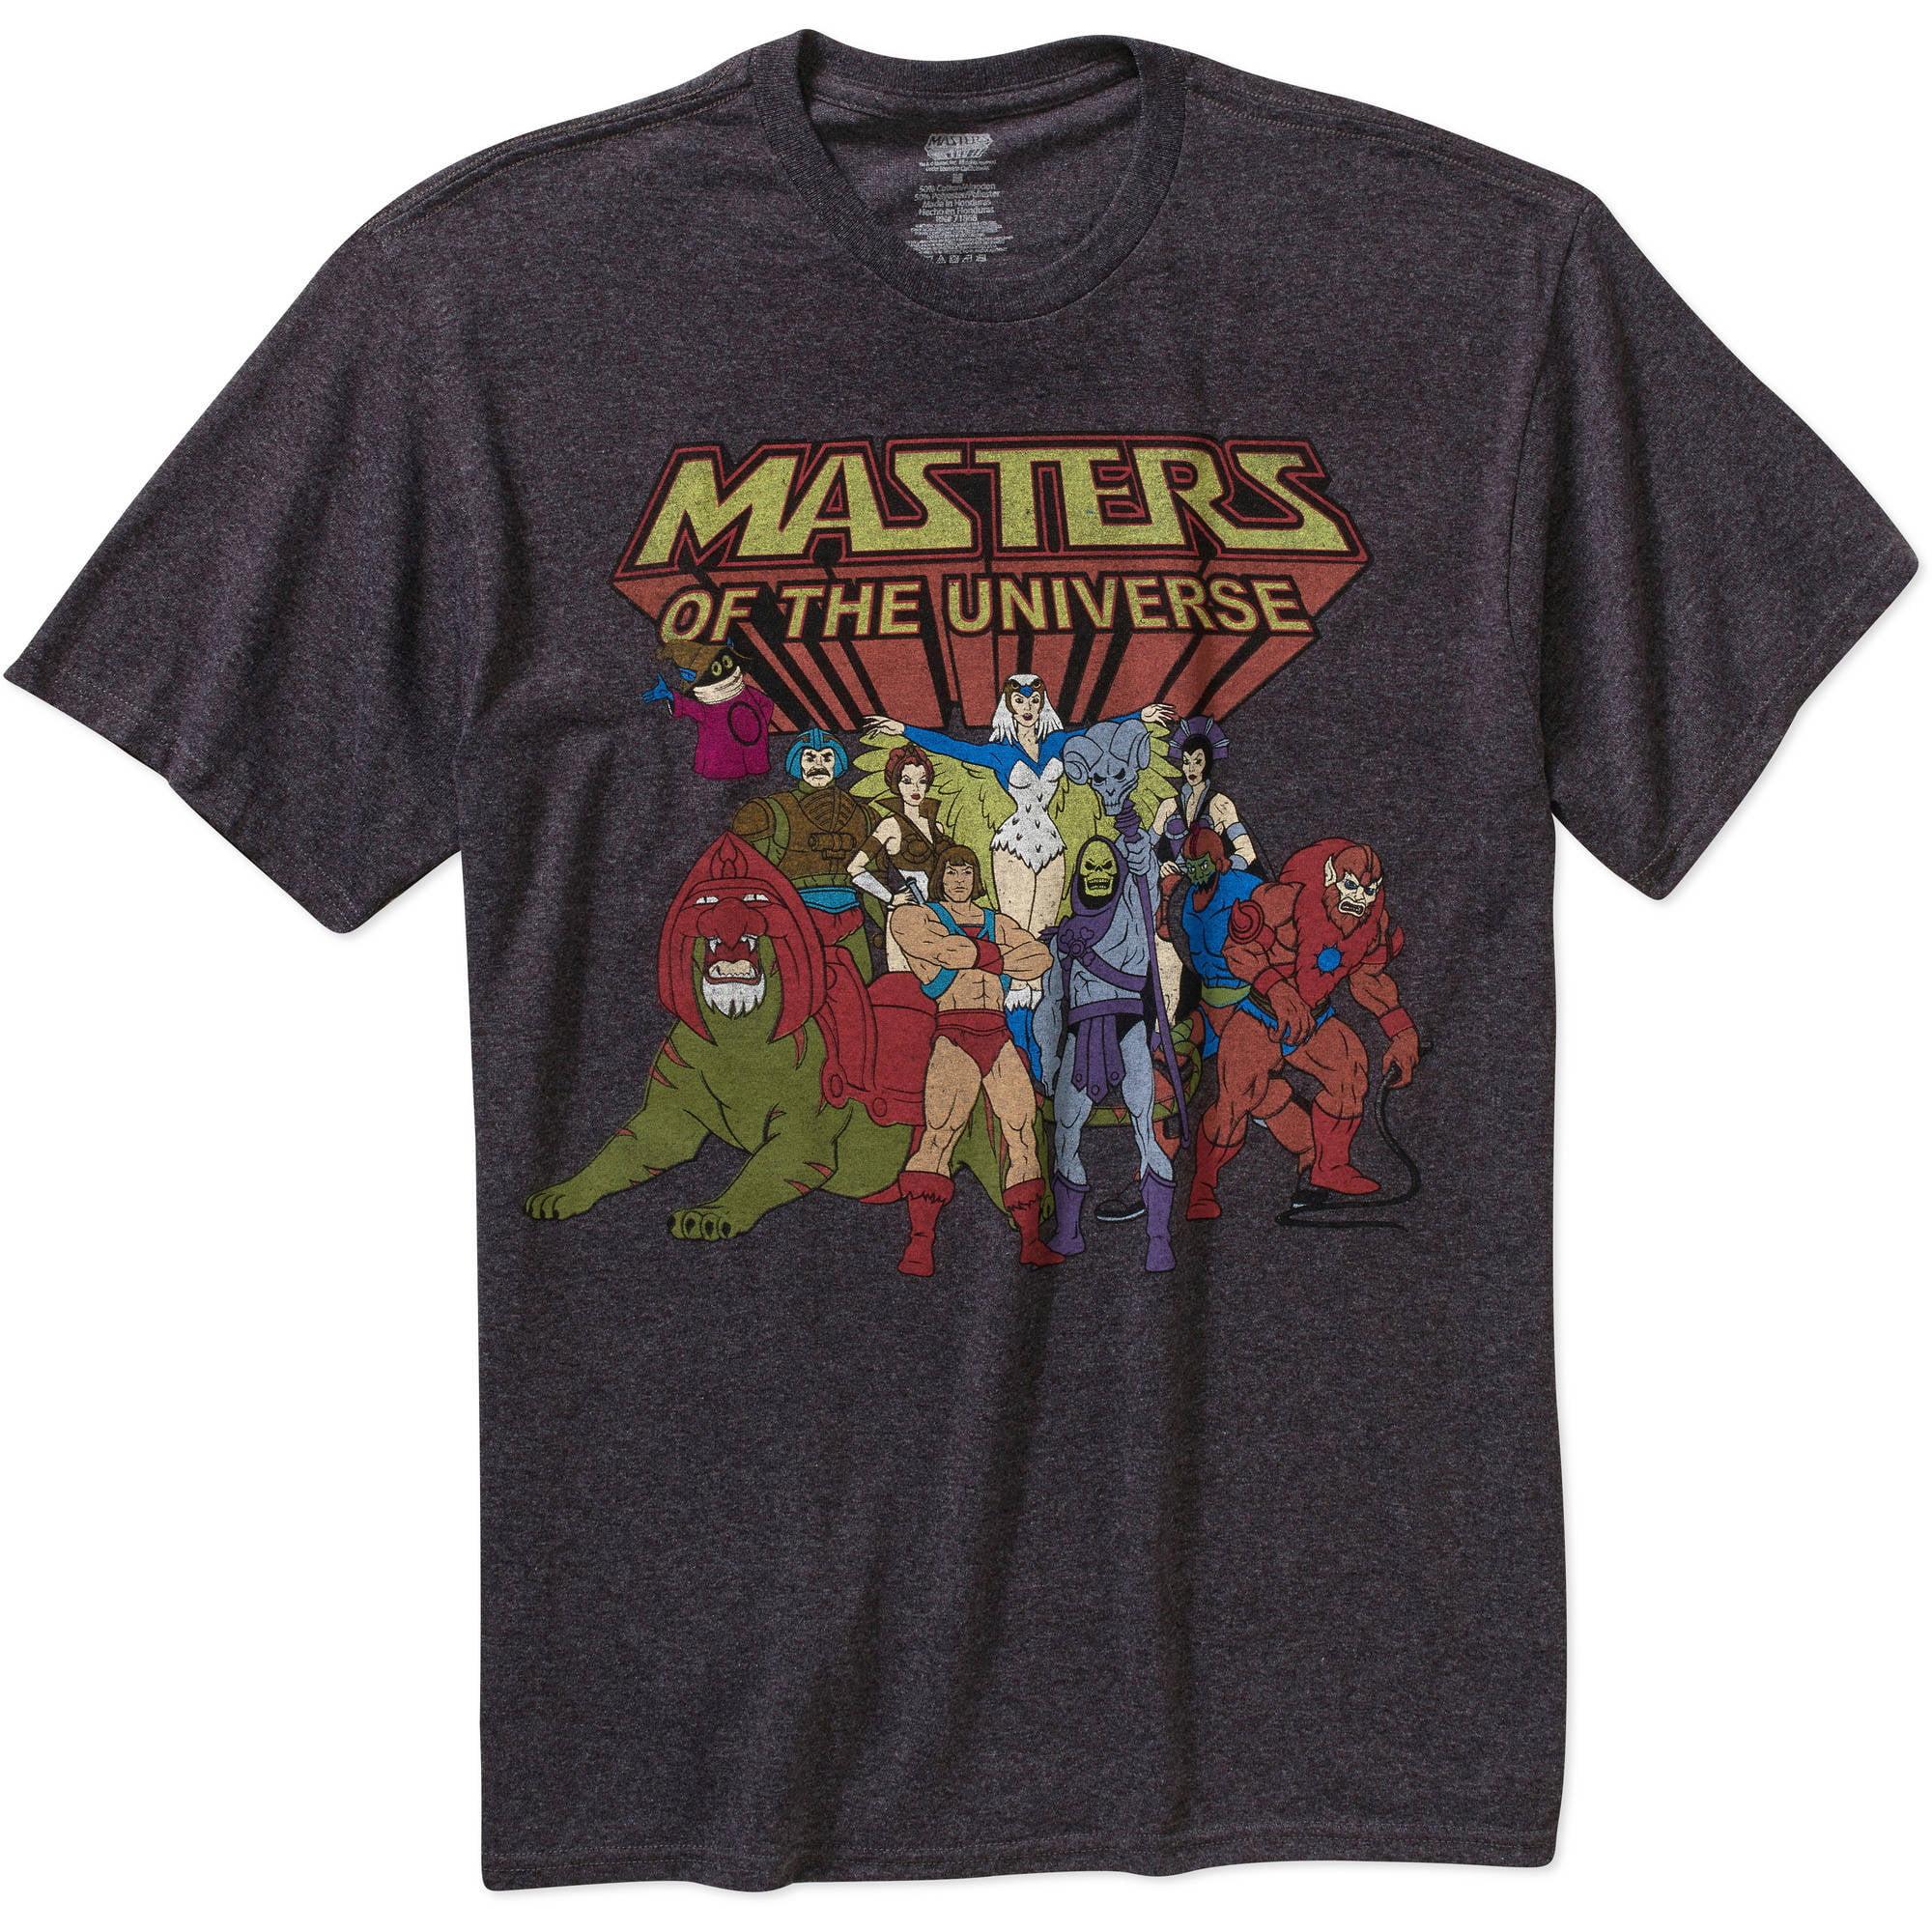 dfdec0ee Bob Ross Men's Galaxy Short Sleeve Graphic T-Shirt, up to Size 3XL -  Walmart.com